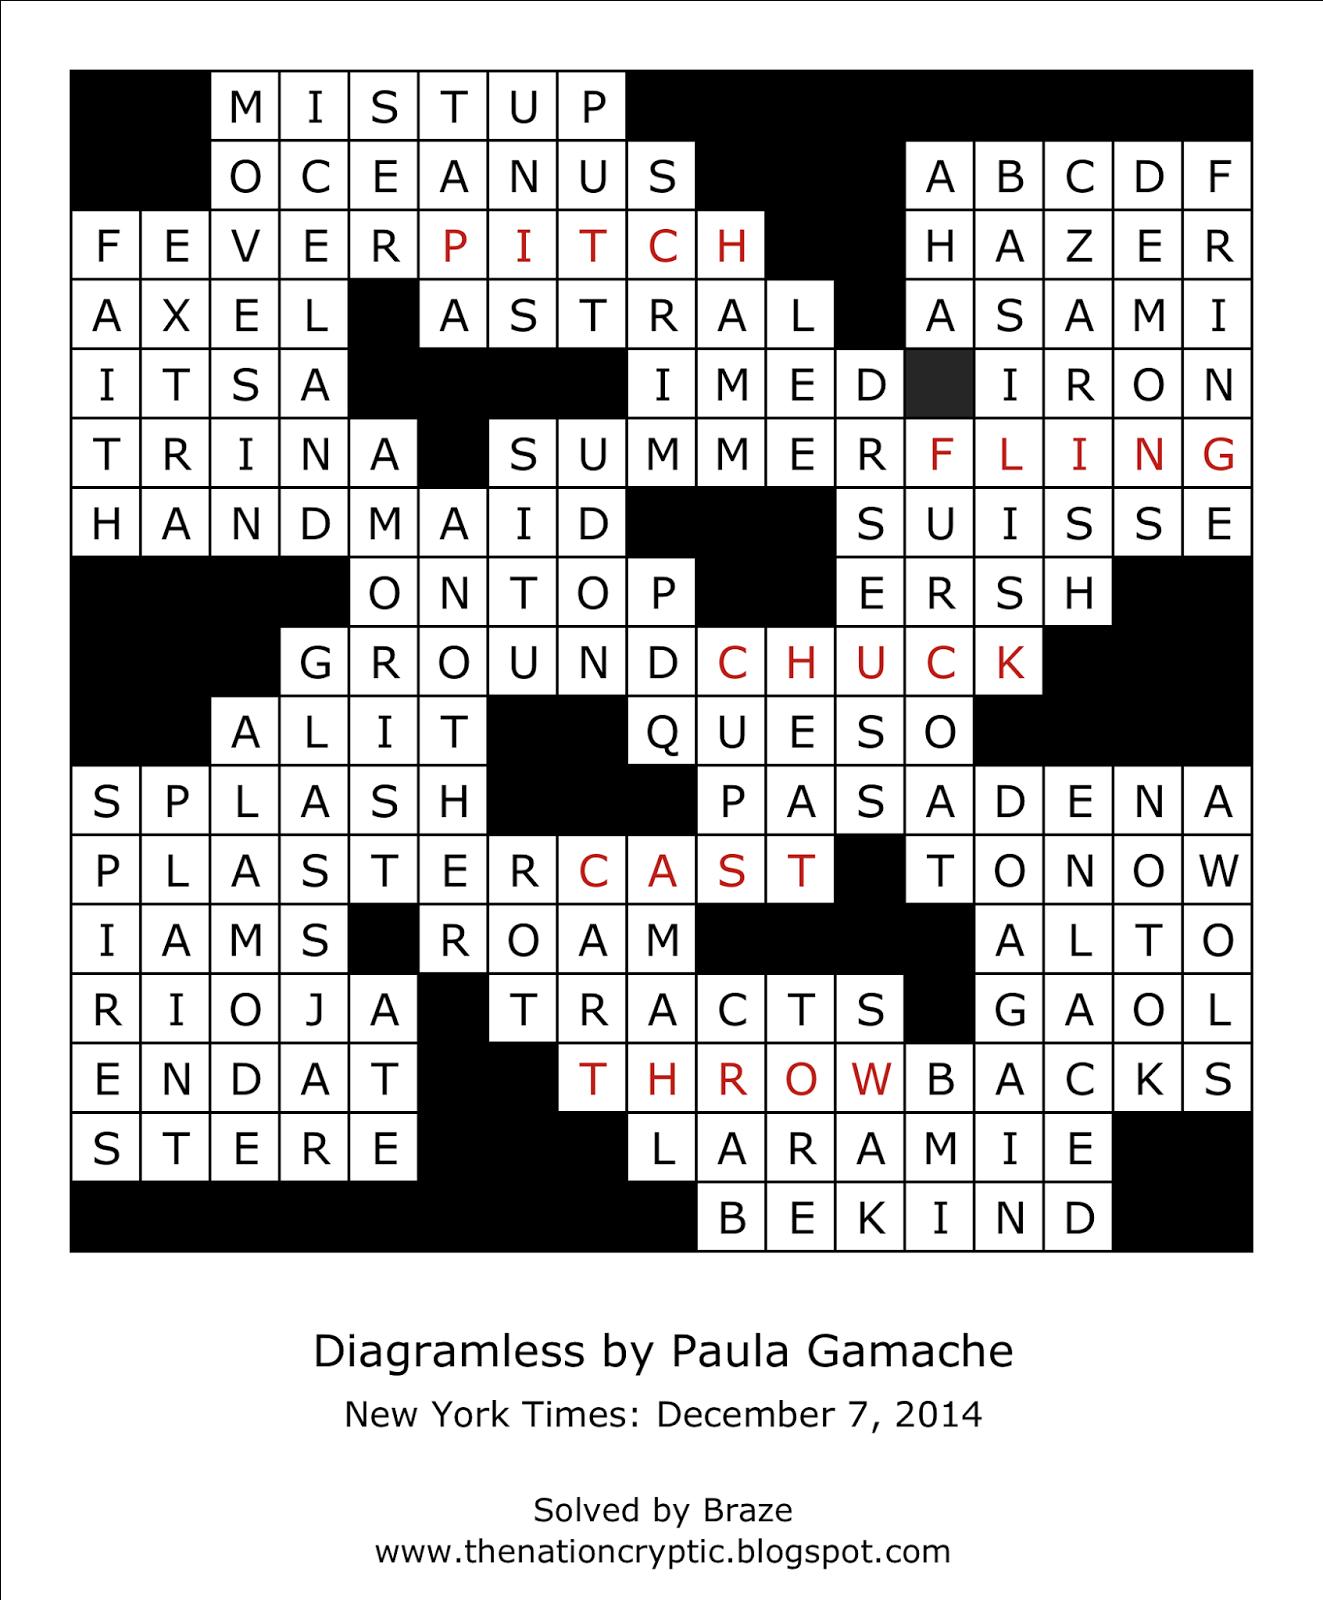 Diagramless Crossword Puzzles - Printable Diagramless Crossword Puzzles